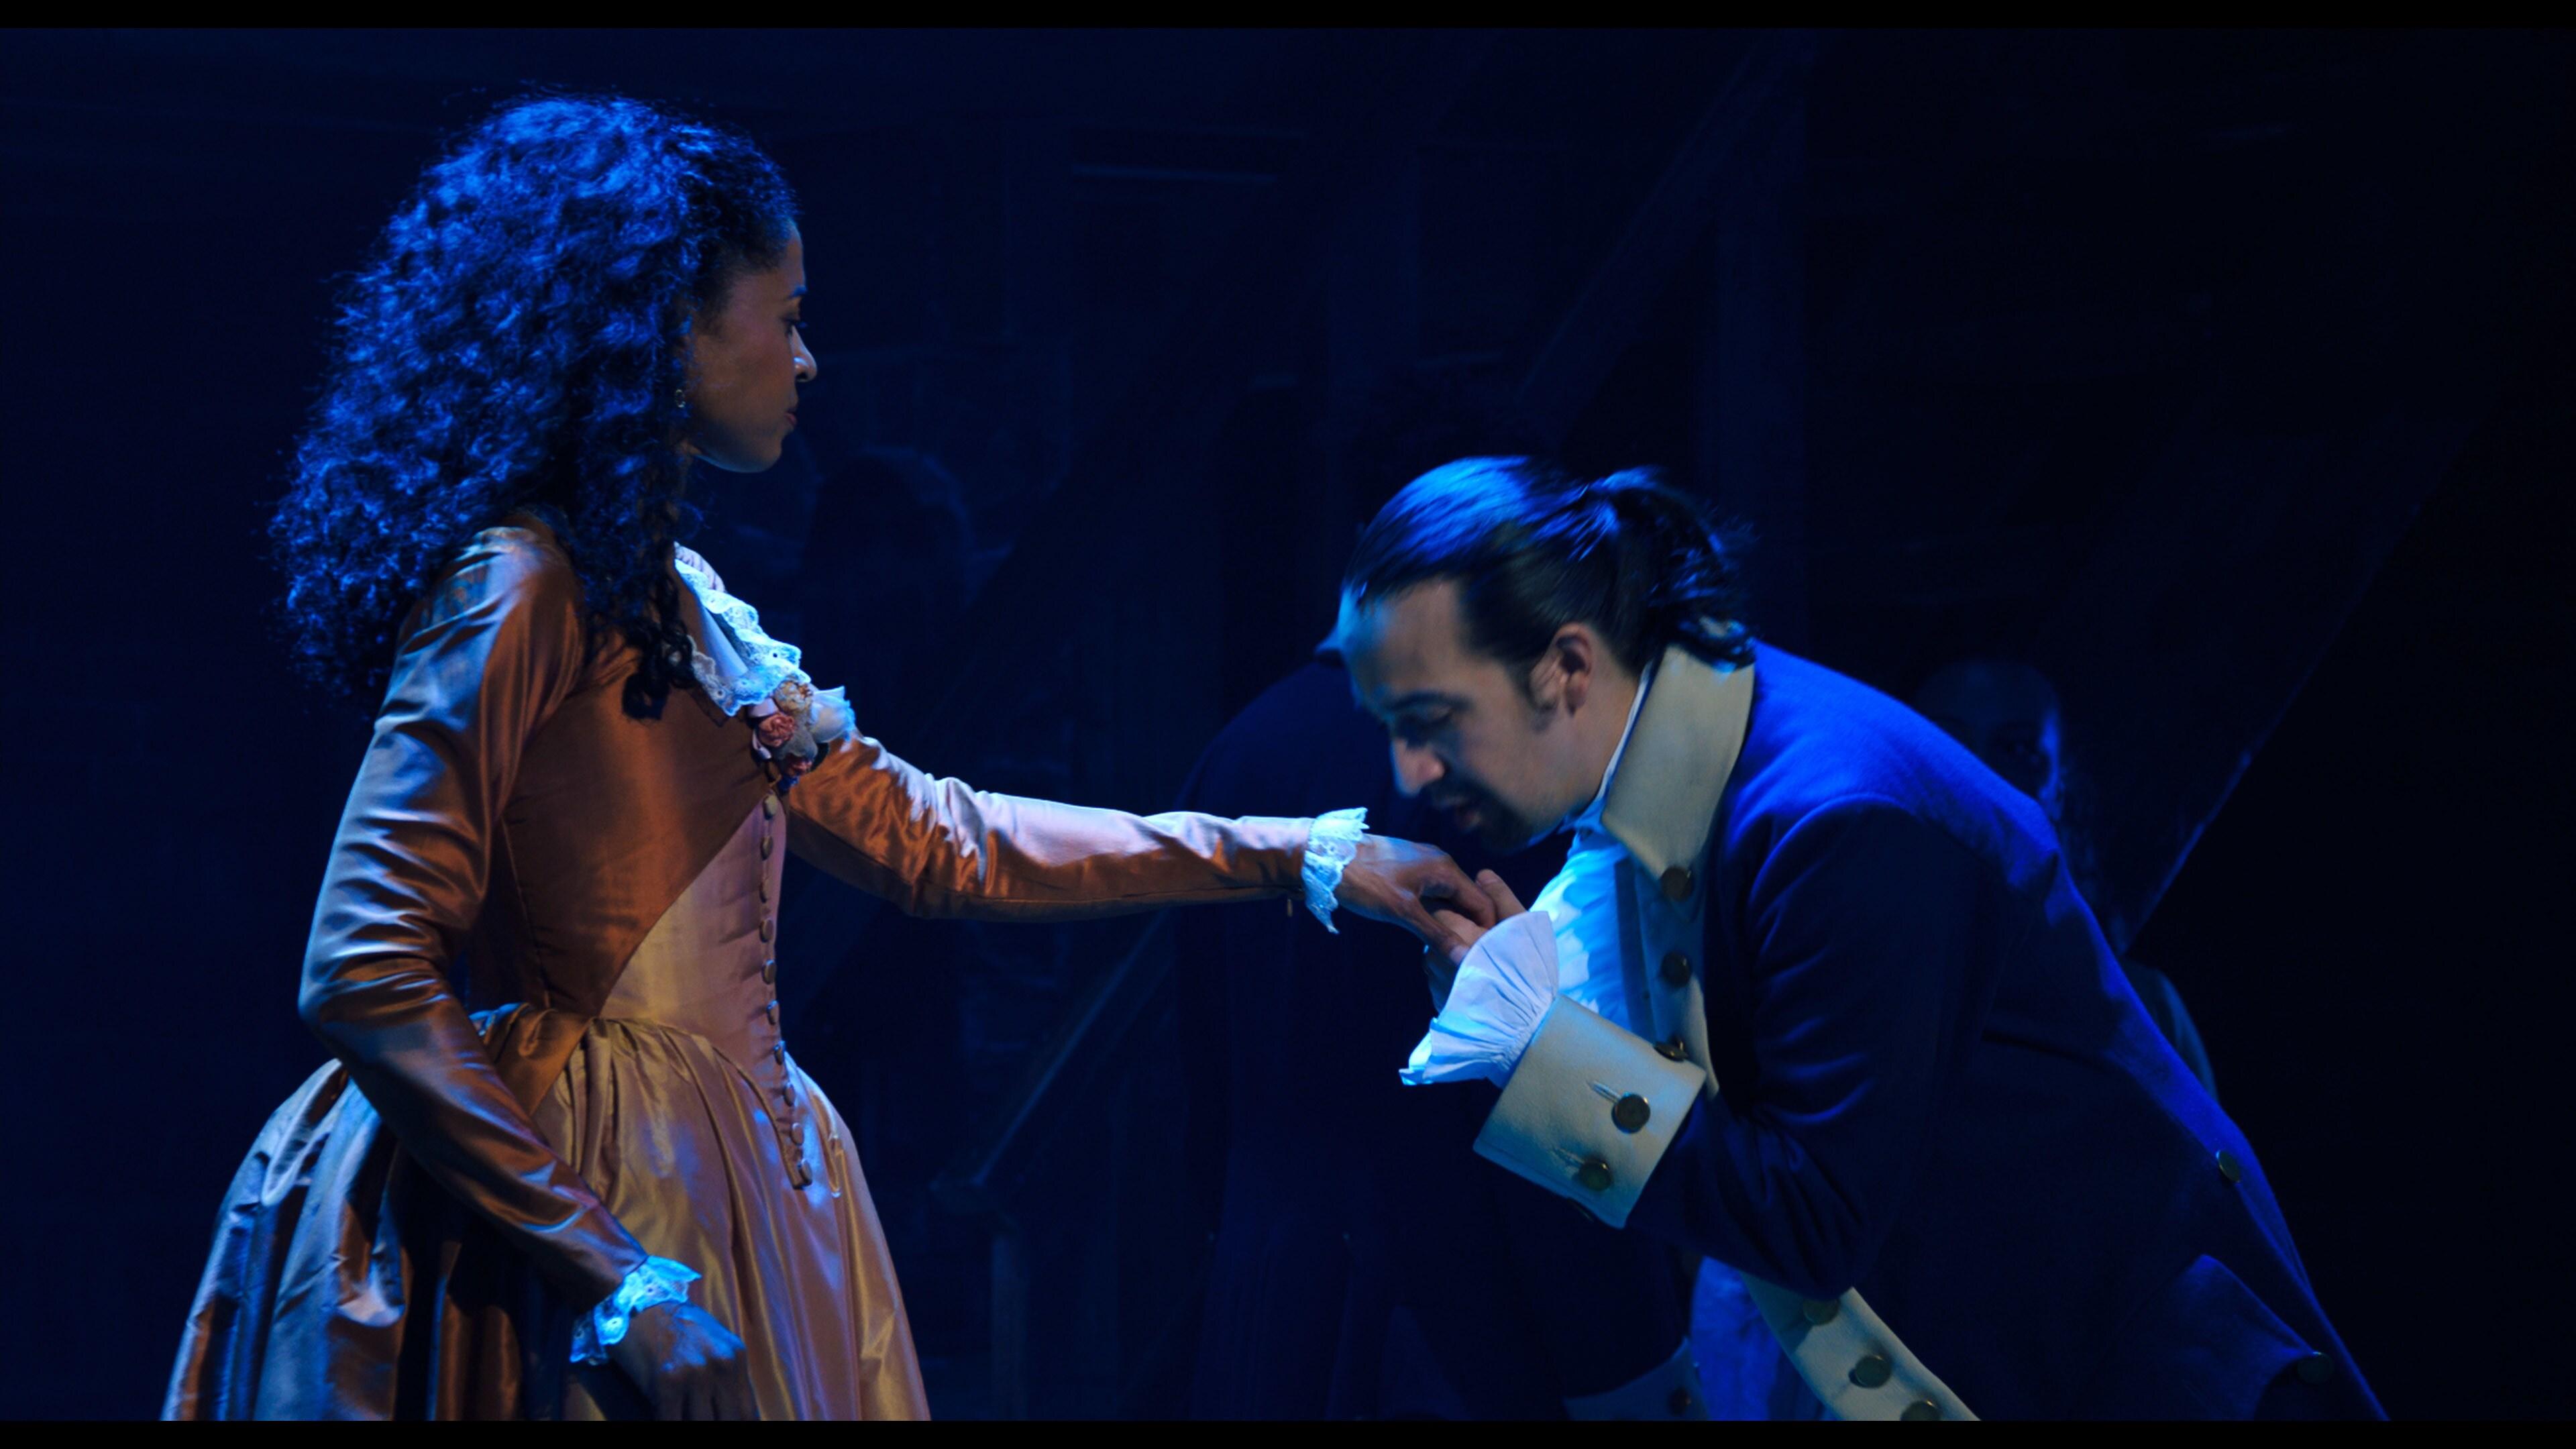 Renée Elise Goldsberry is Angelica Schuyler and Lin-Manuel Miranda is Alexander Hamilton in HAMILTON, the filmed version of the original Broadway production.